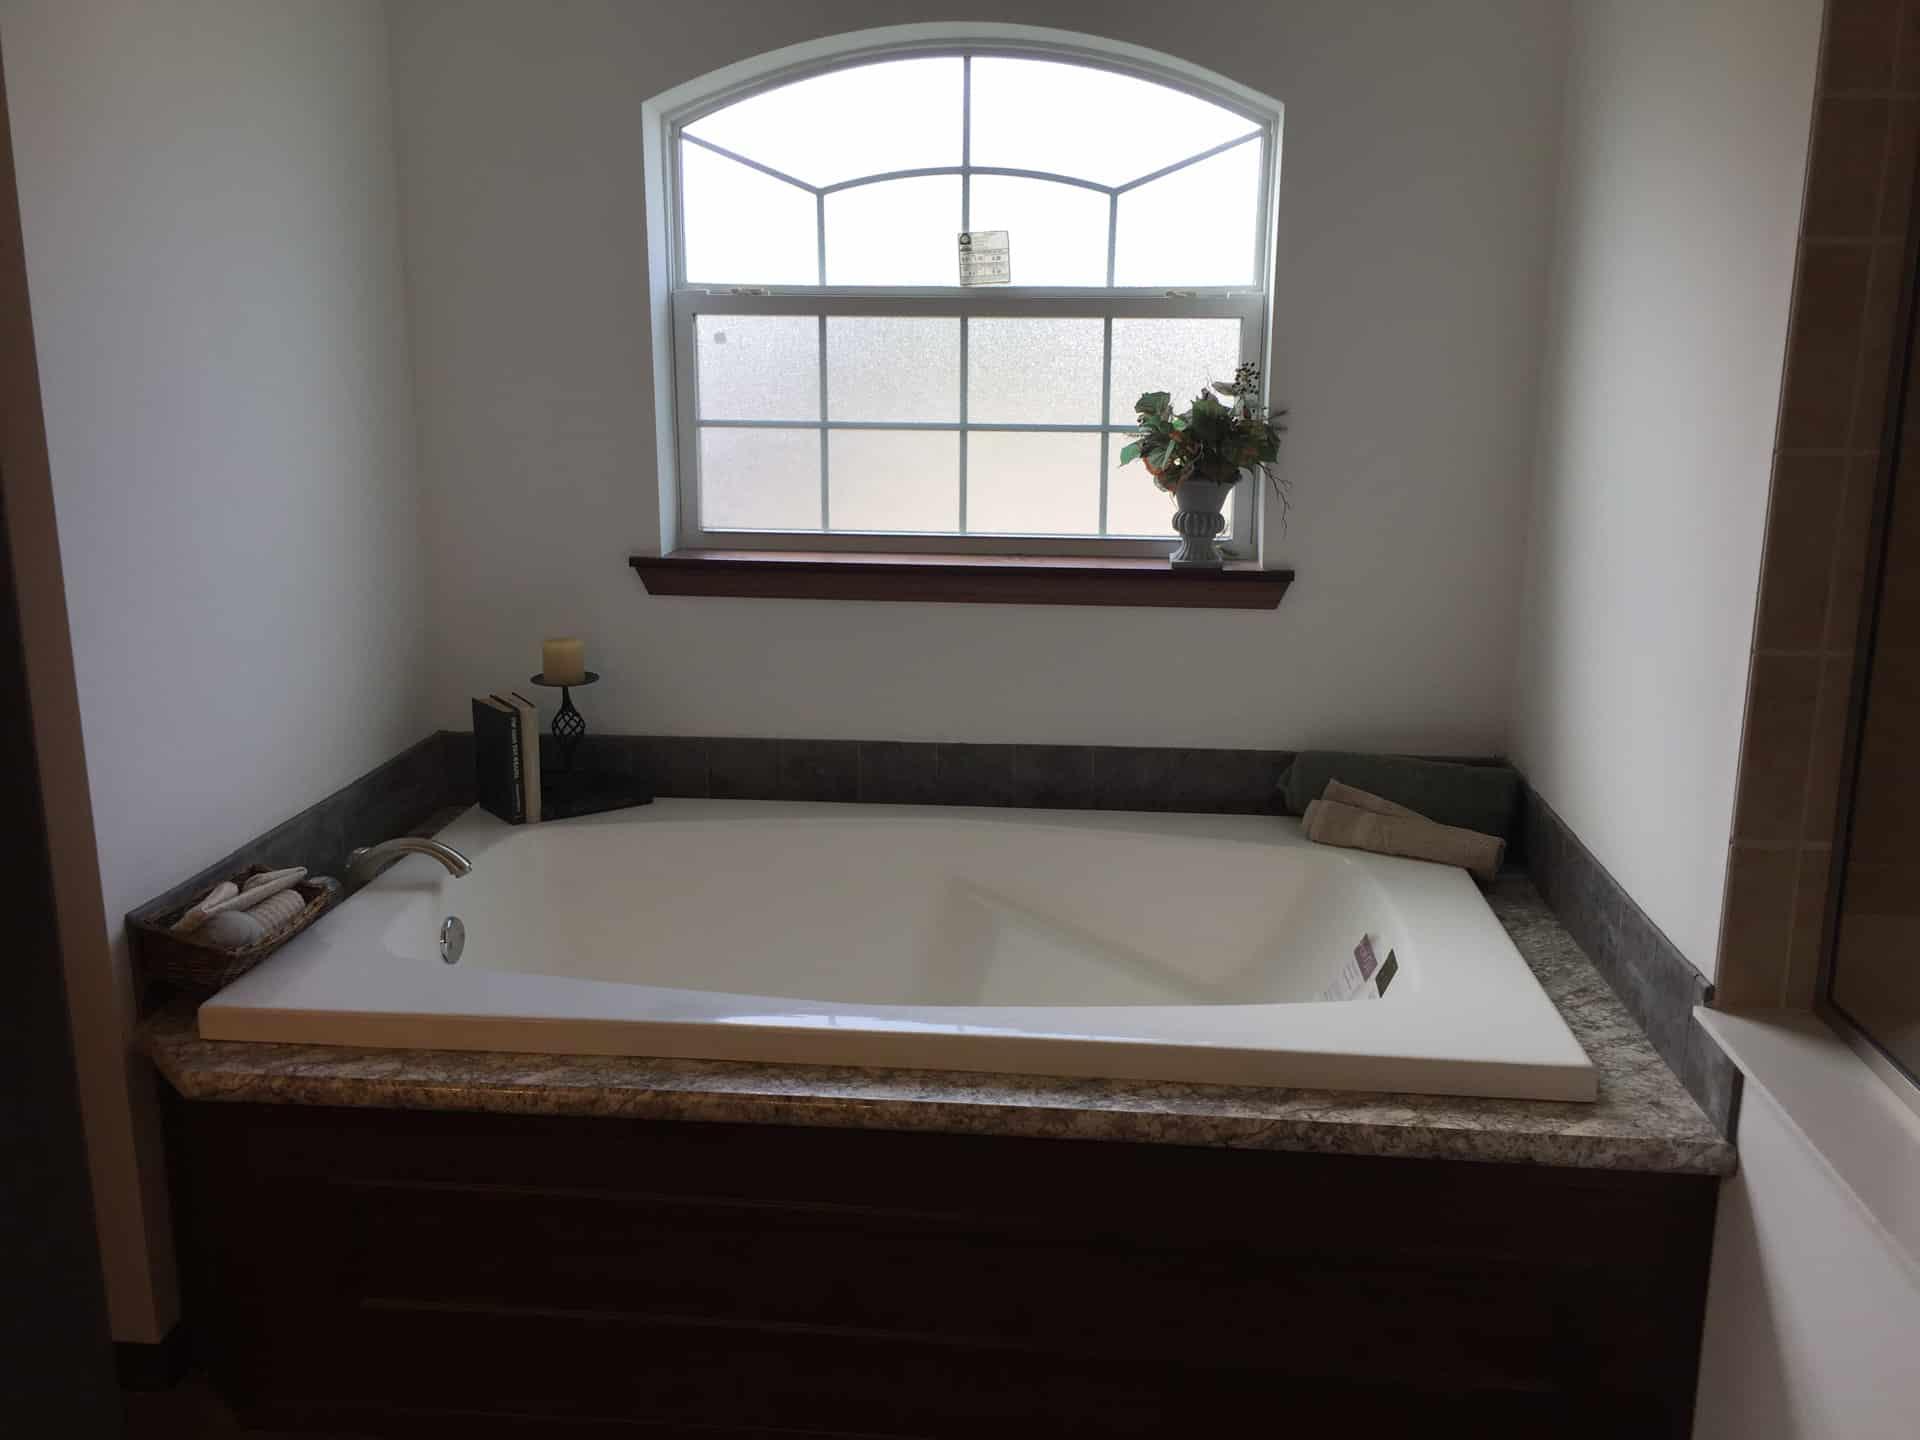 Lionel large tub